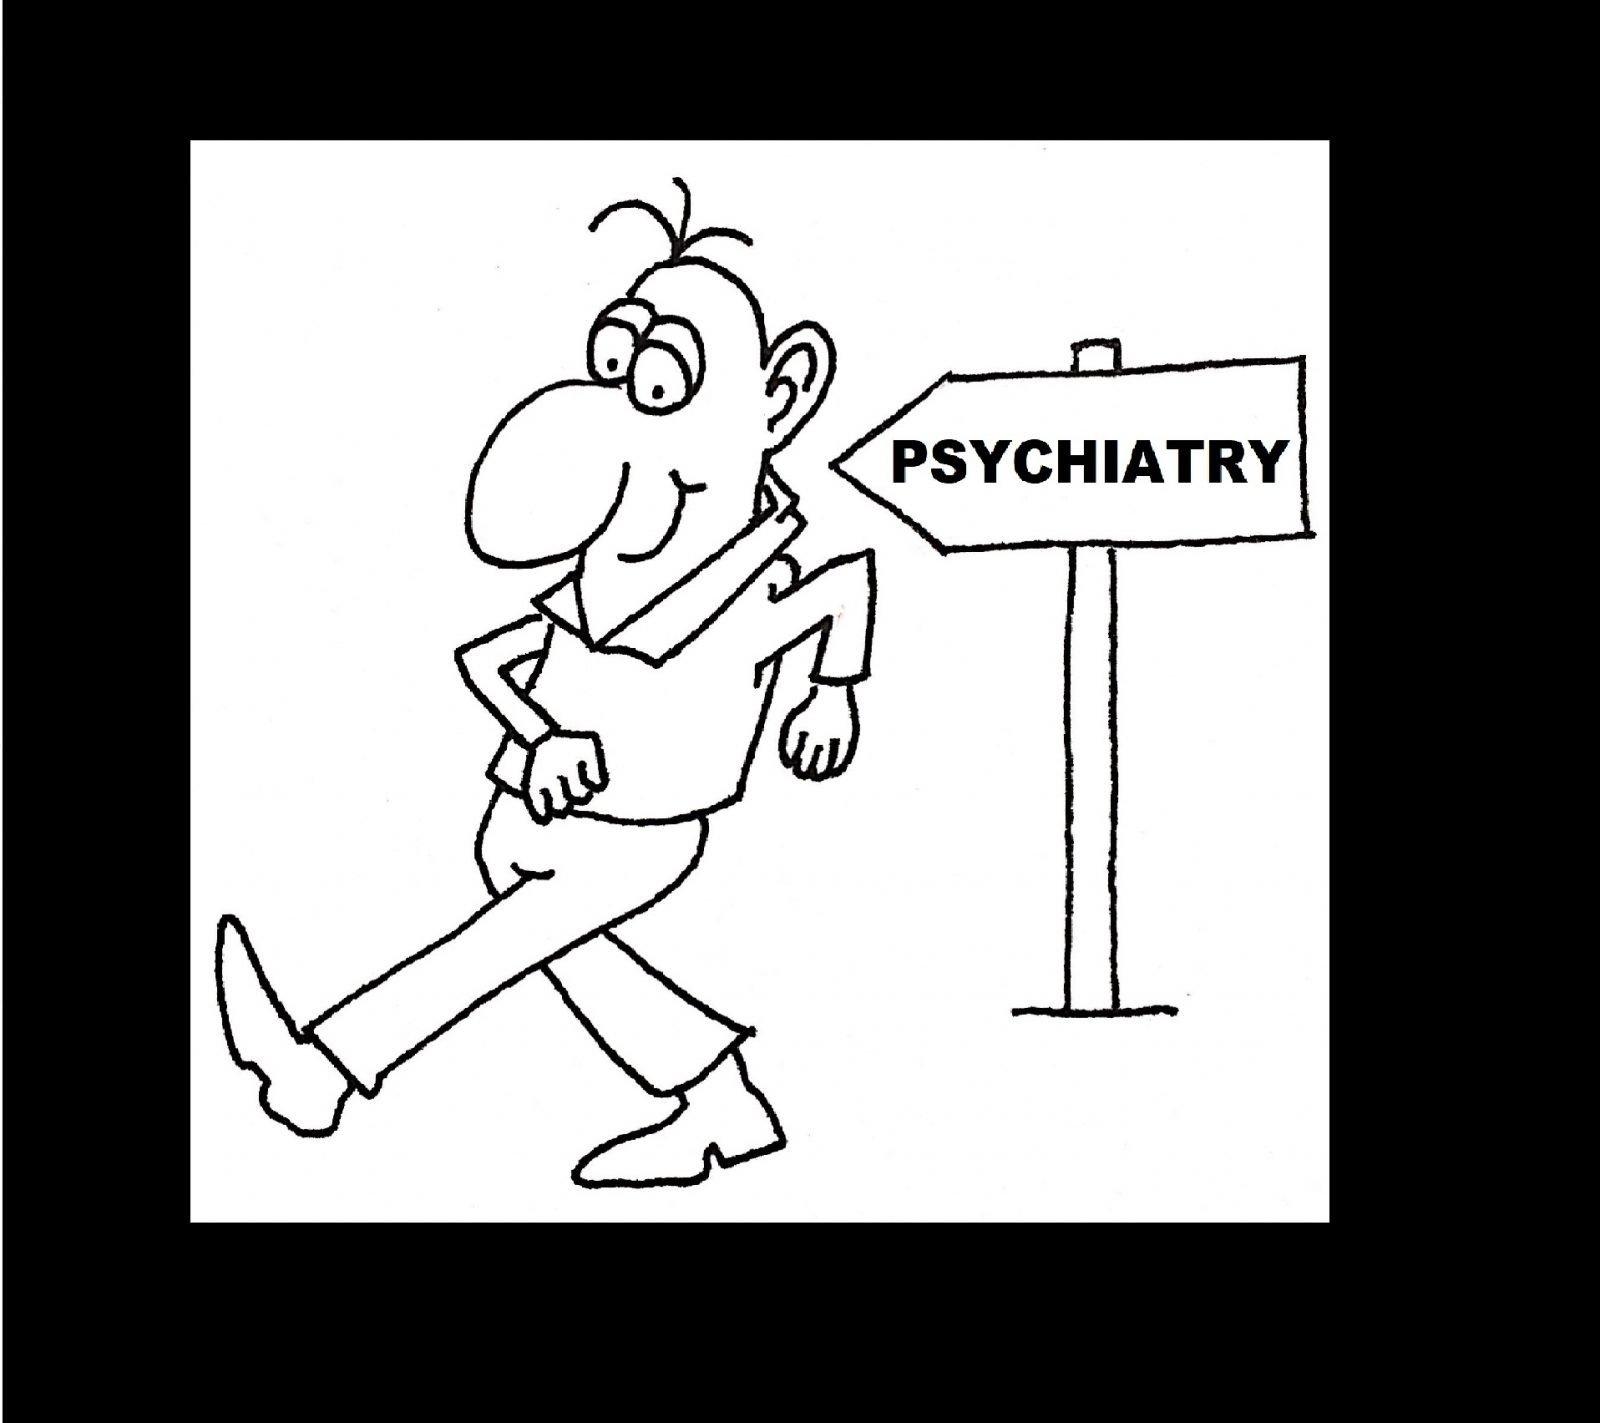 Psychiatry With Black Border